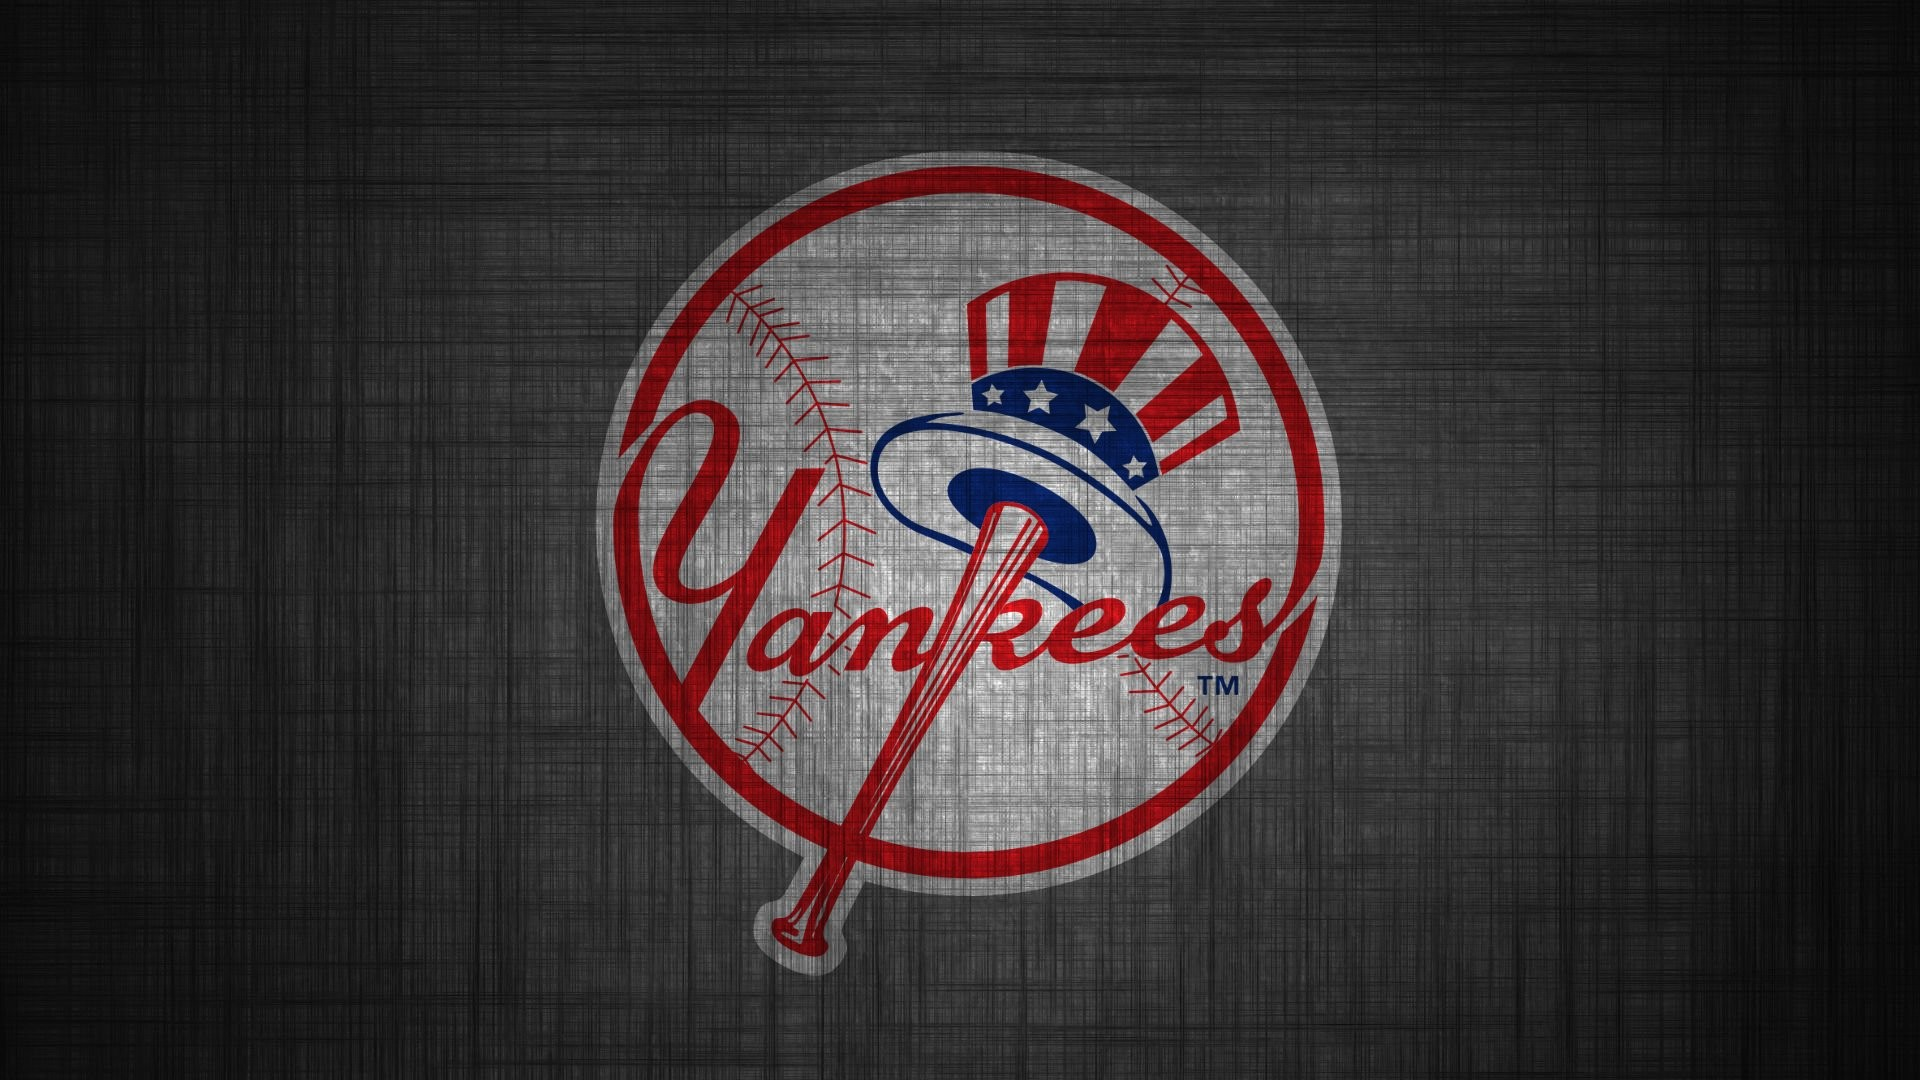 1920x1080 0 New York Yankees Wallpapers Group New York Yankees Wallpapers HD Pixels Talk